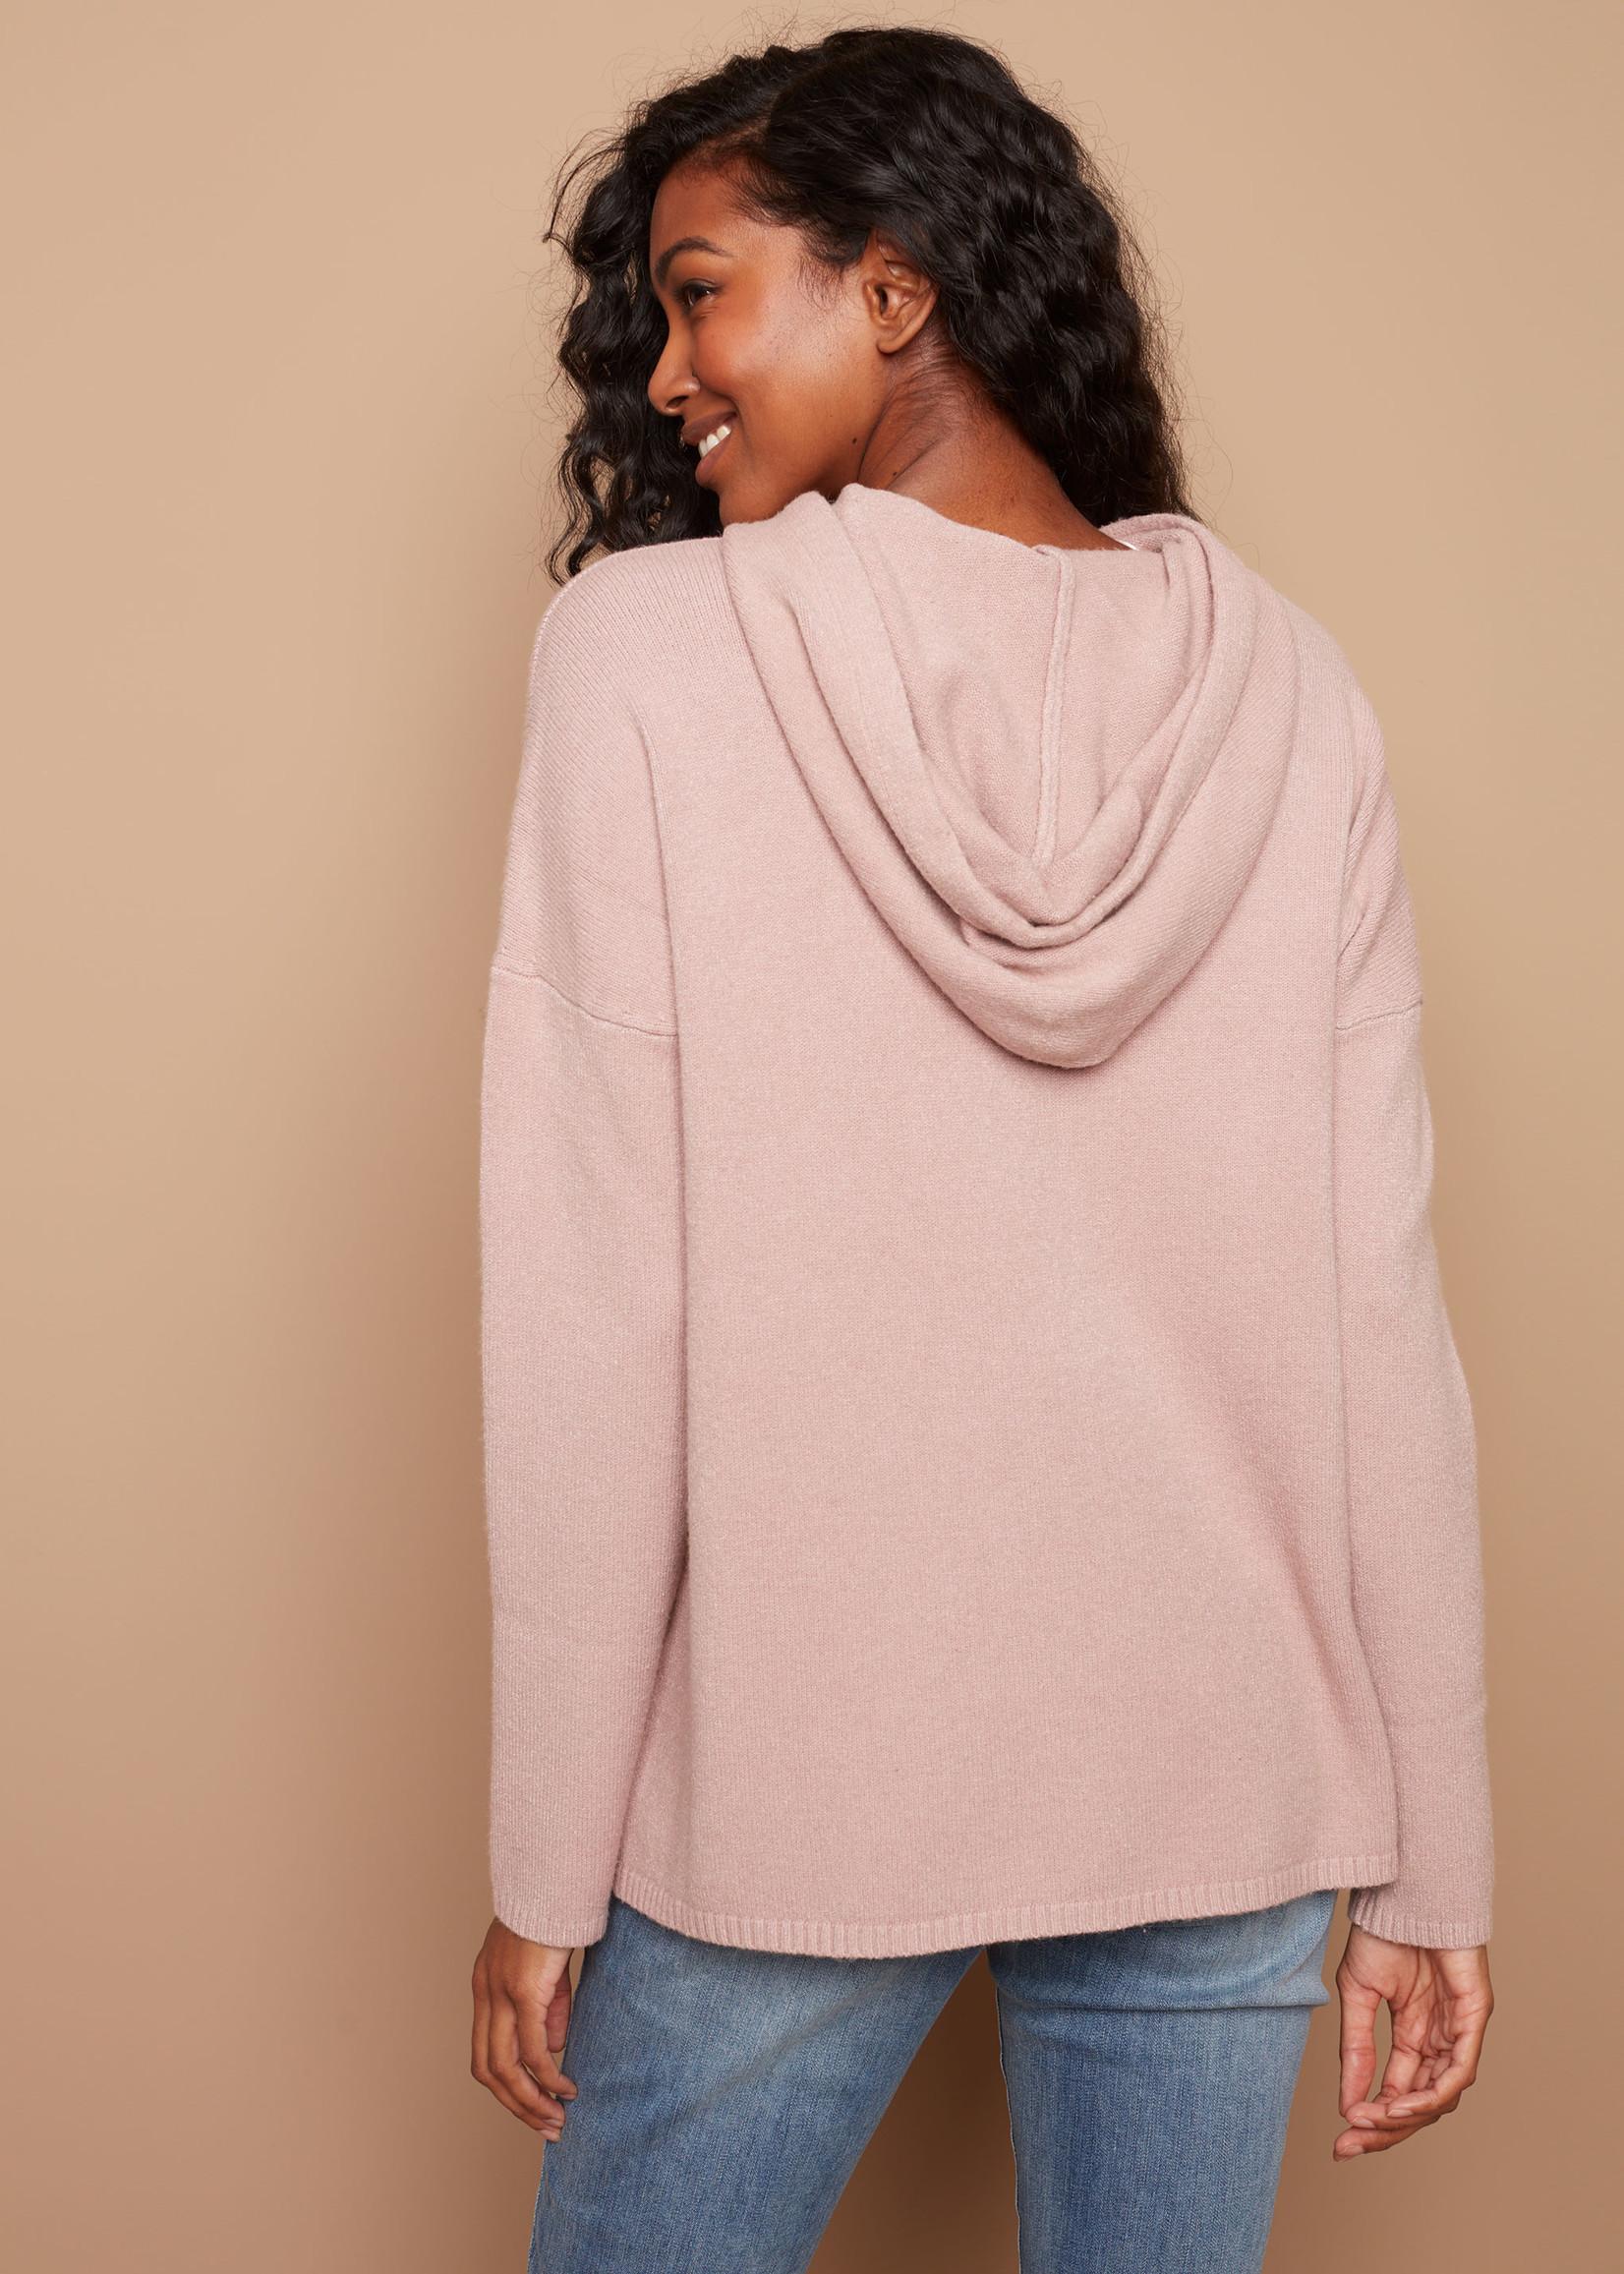 Charlie B Plush Hooded Knit Sweater